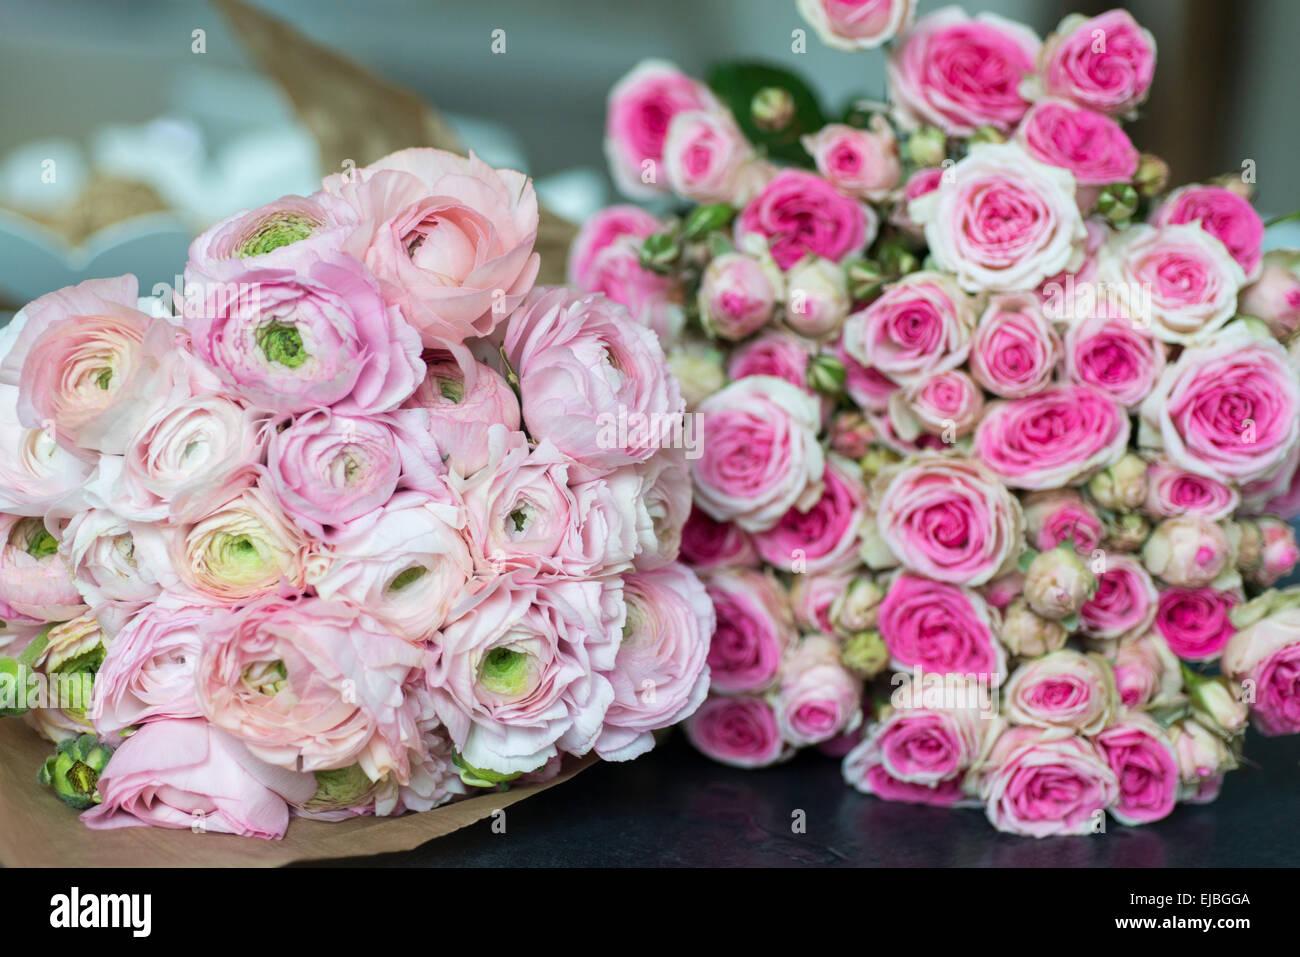 Bouquet of pink ranunculus and Mimi Eden spray roses in Paris apartment - Stock Image